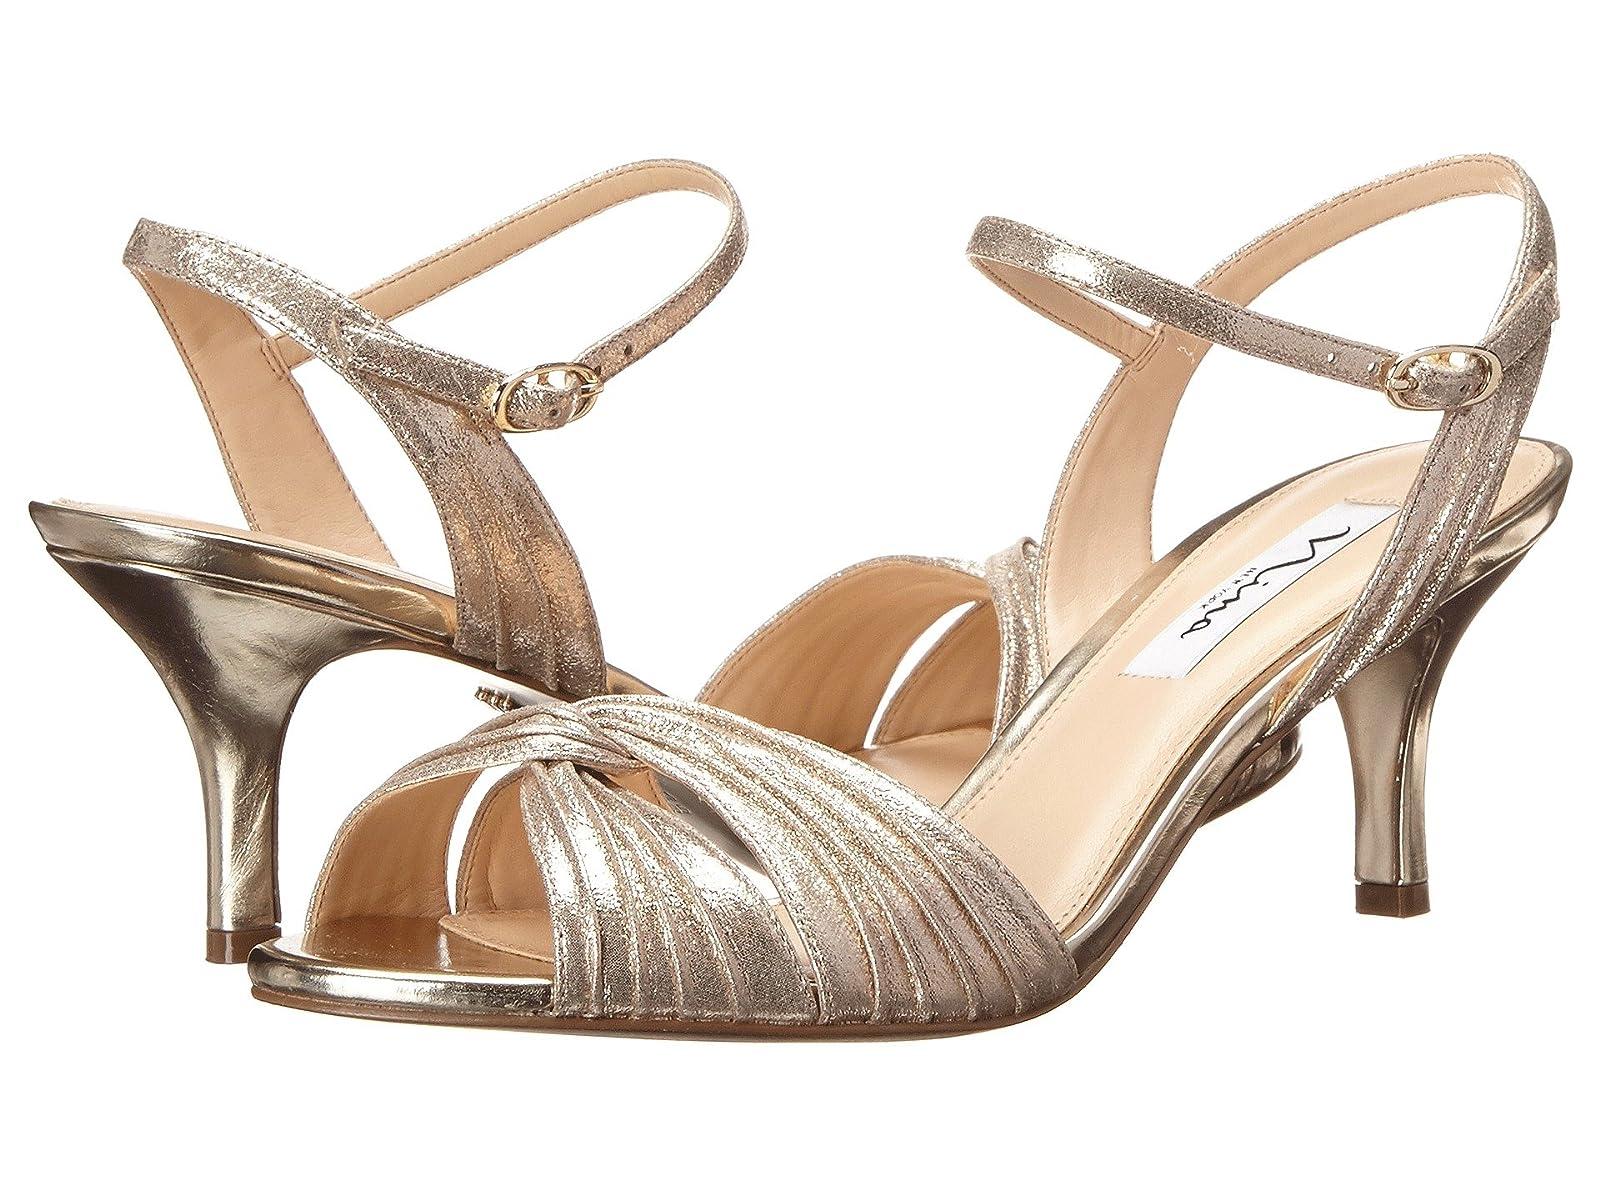 Nina CamilleCheap and distinctive eye-catching shoes